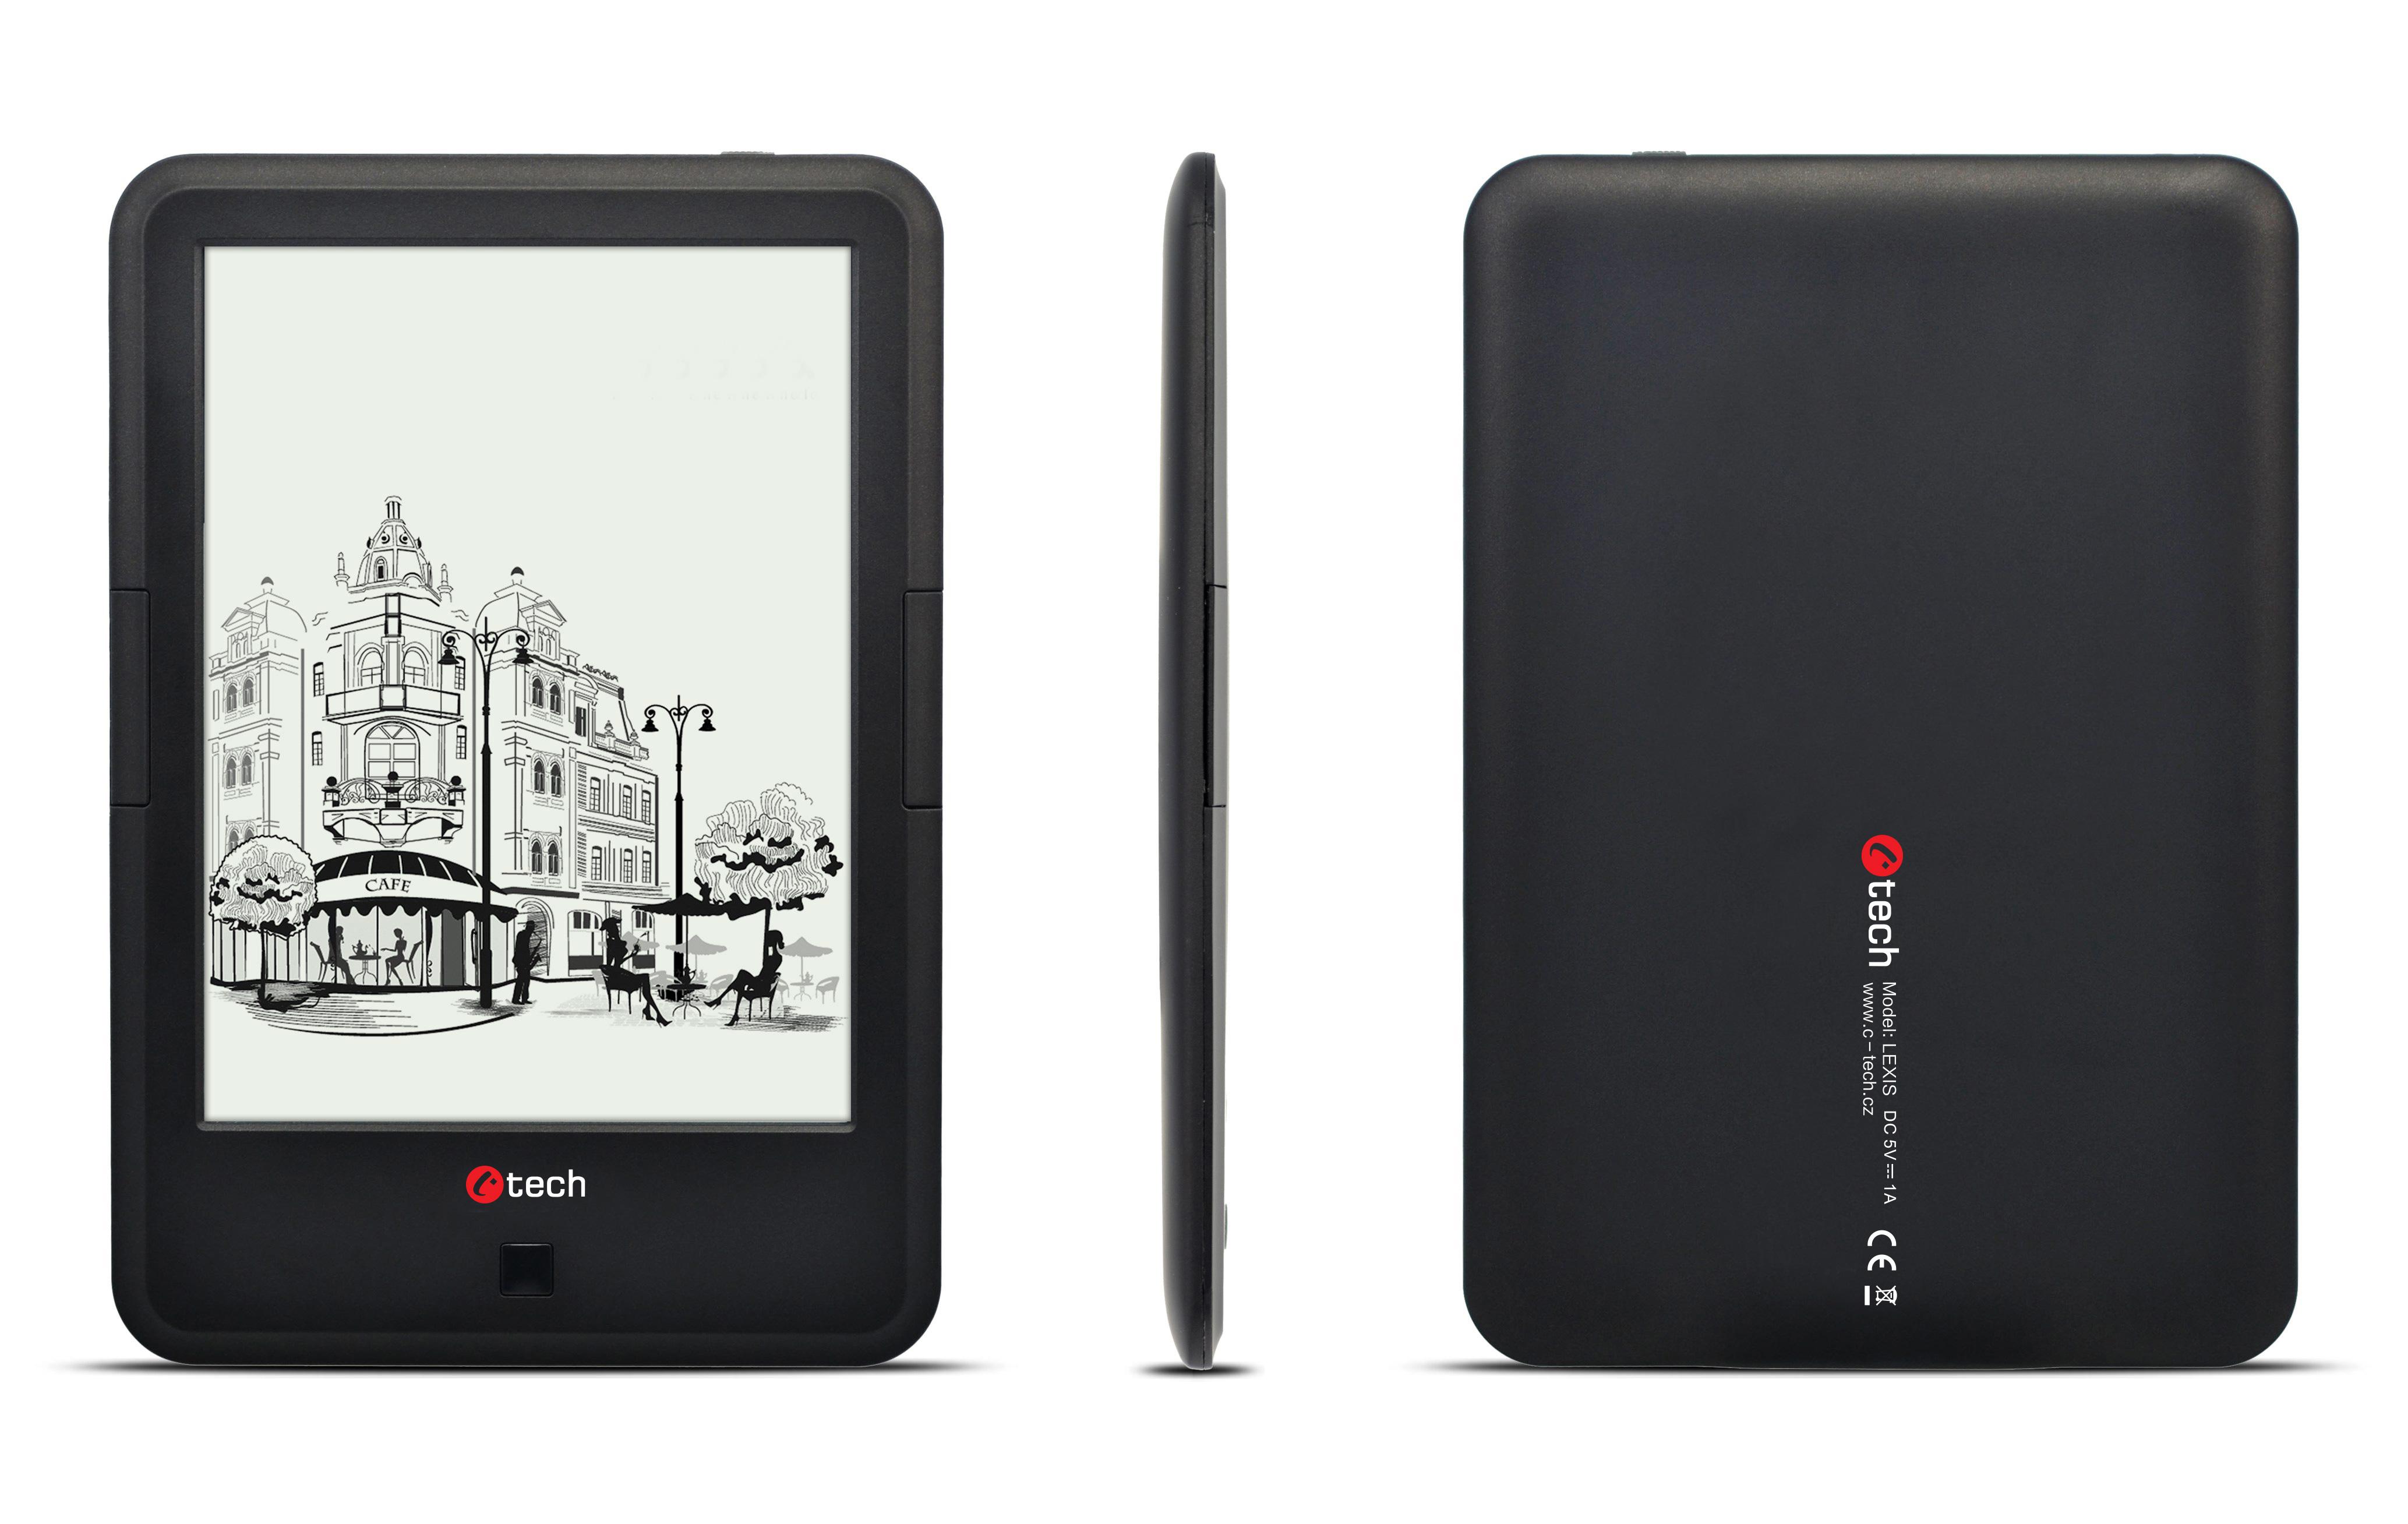 C-TECH E-book Lexis (EBR-61), dual core, Android 4.2, dotyková HD obrazovka s podsvícením, Wi-Fi, 8GB, černý + 100 knih